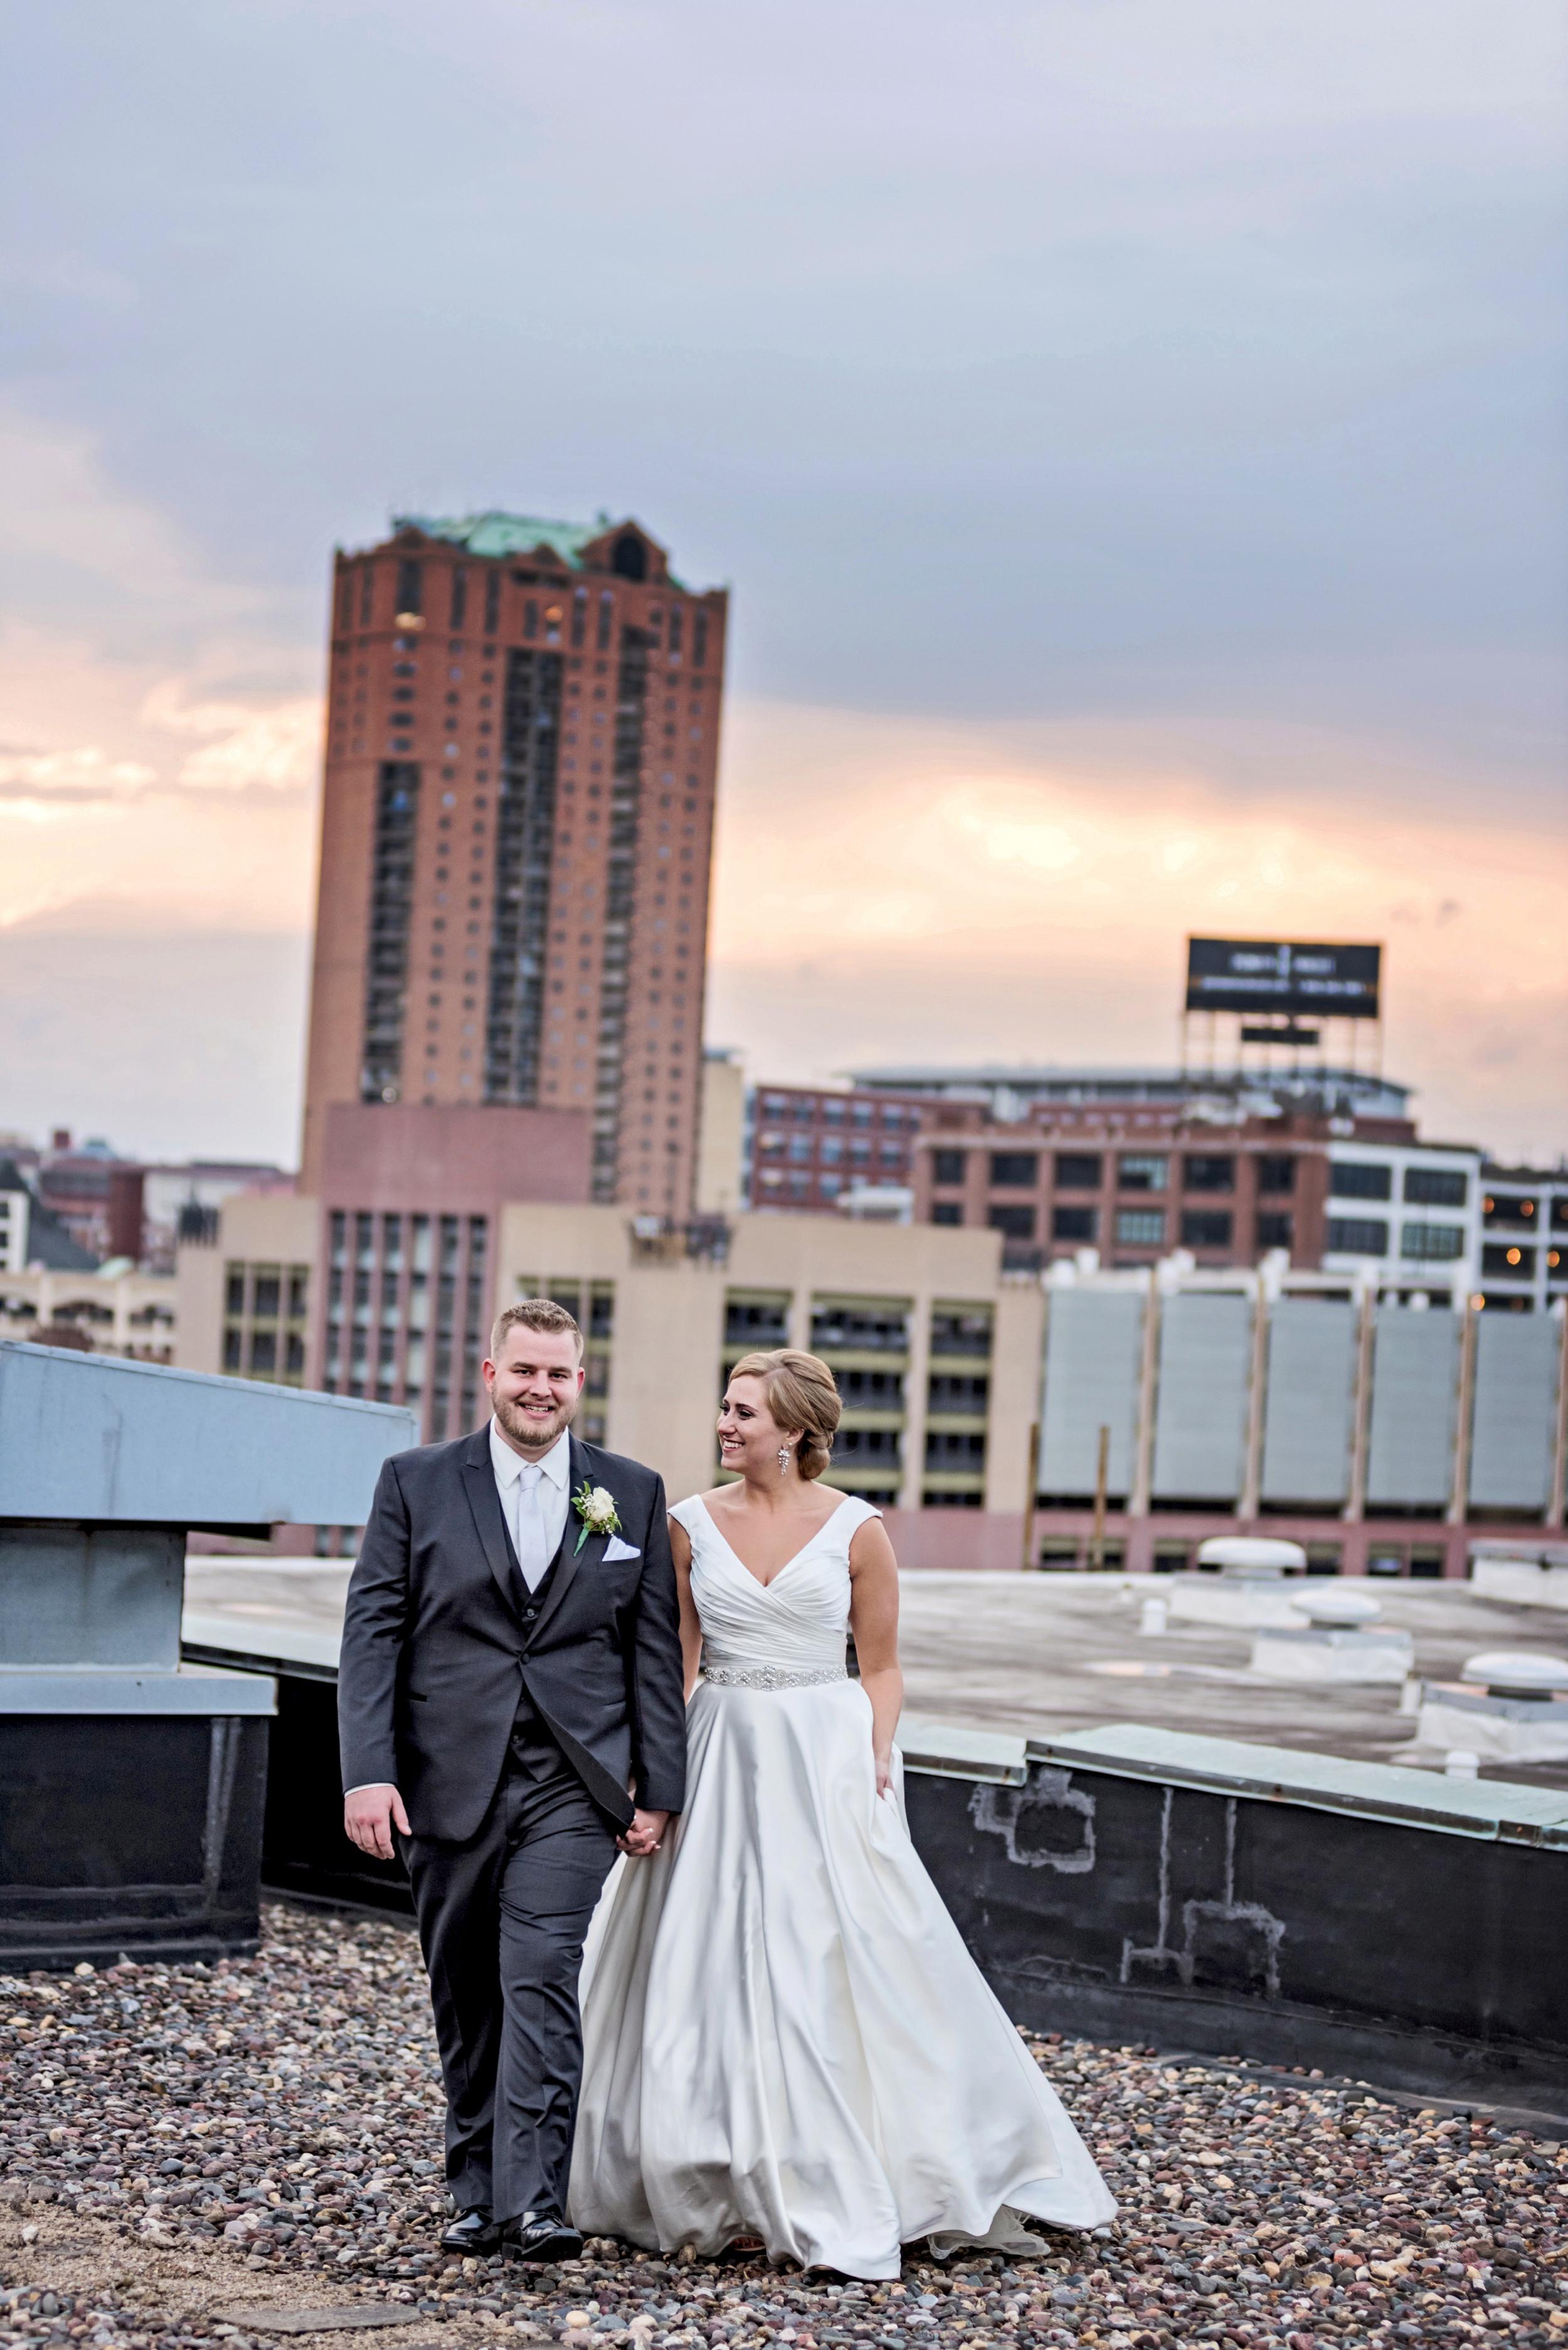 2018-Real-Wedding-Megan-Brenden-Rotella-Photography_0500.jpg